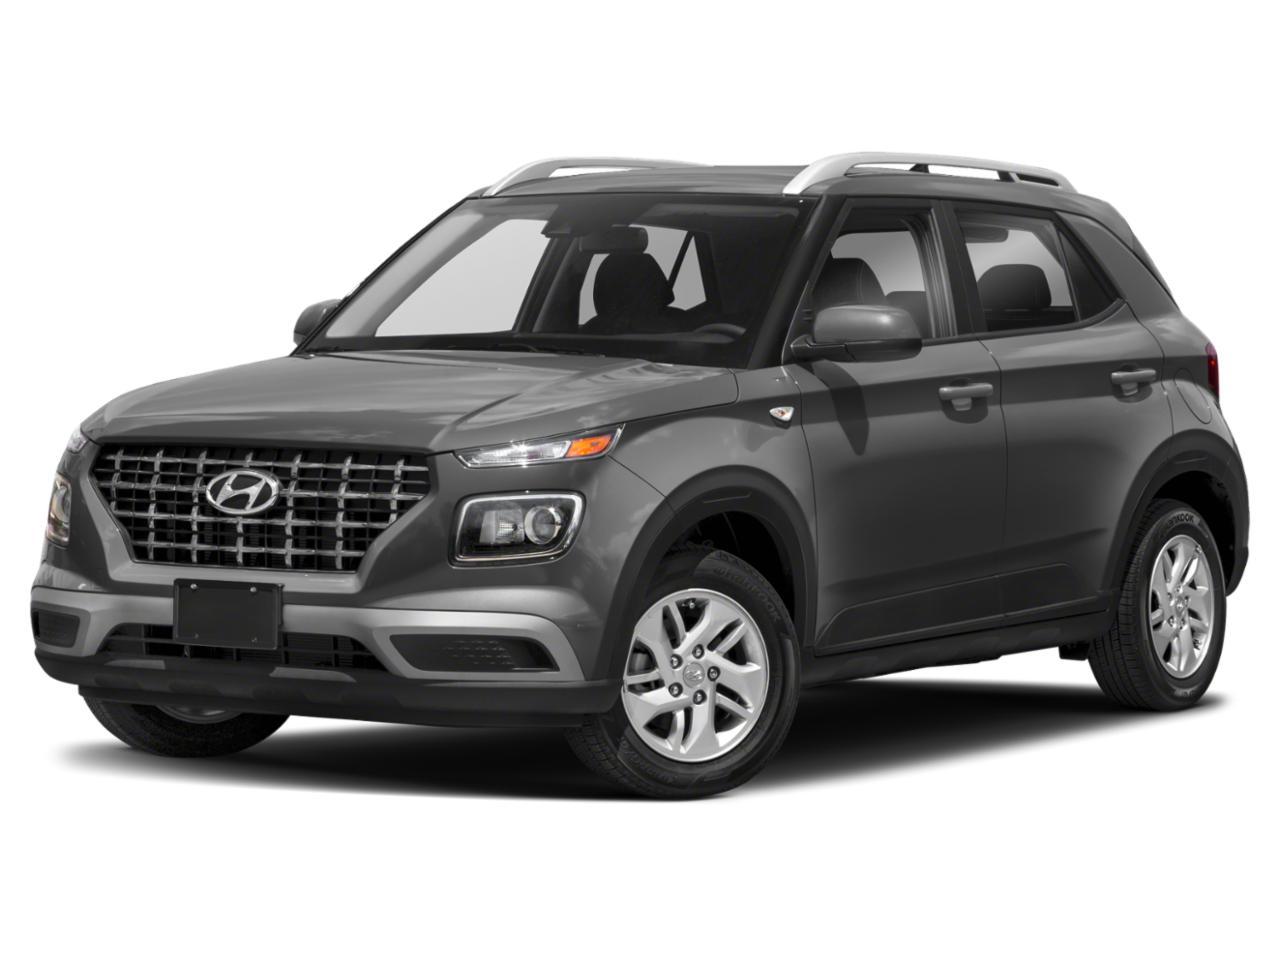 2021 Hyundai Venue Vehicle Photo in Odessa, TX 79762